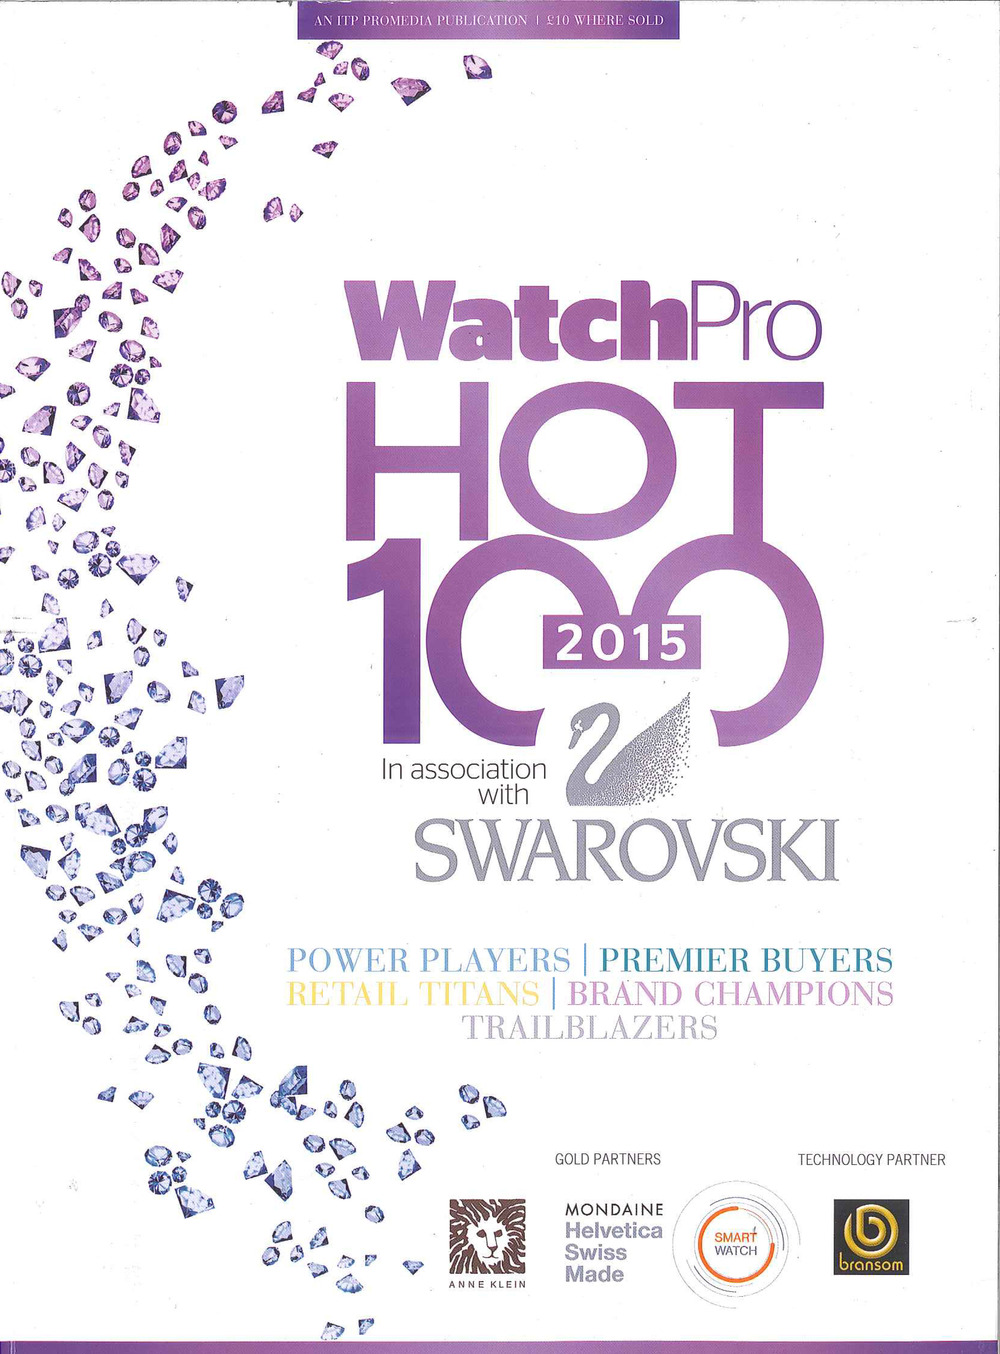 WatchPro